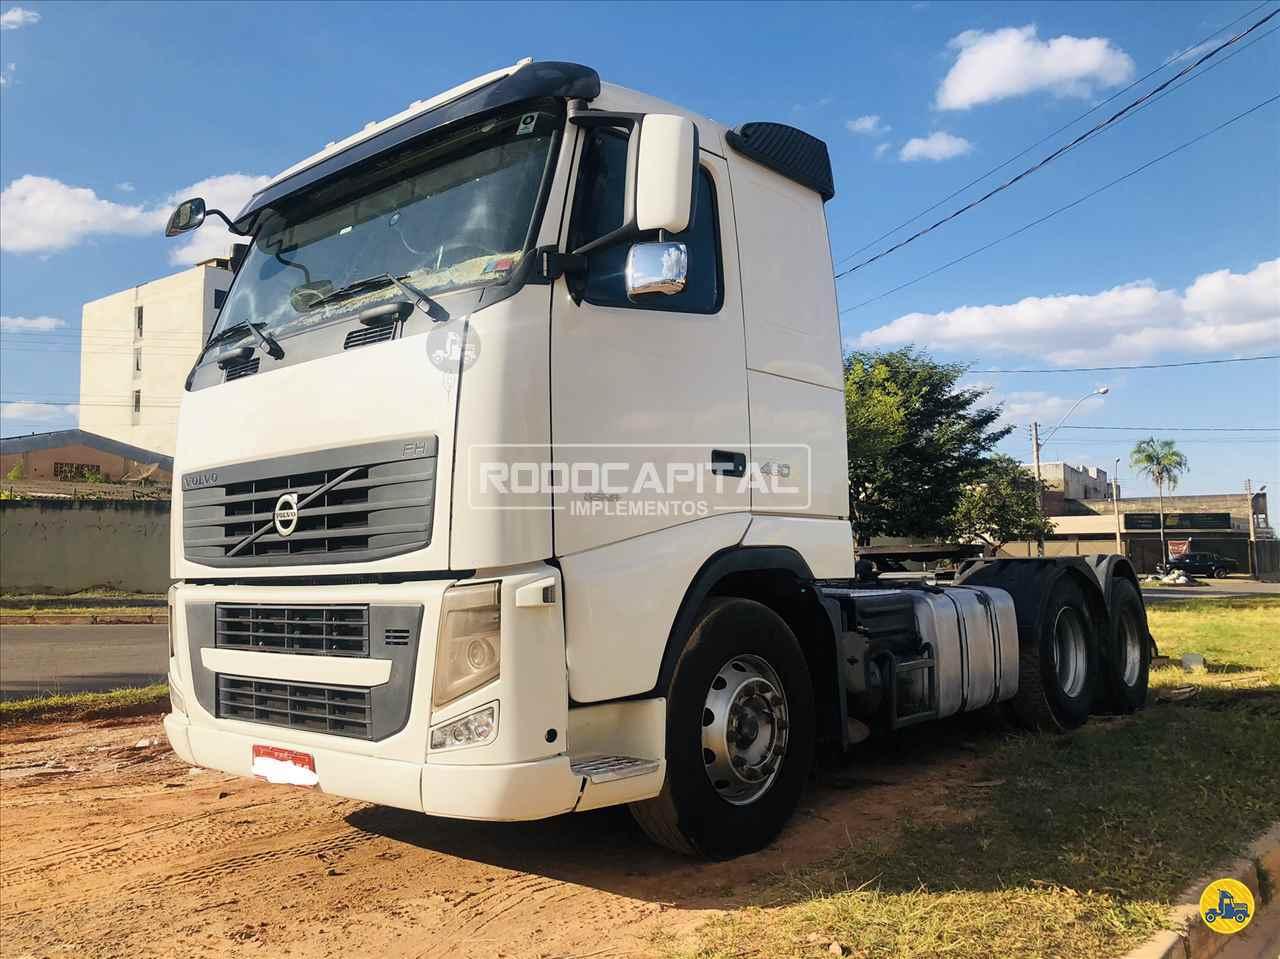 CAMINHAO VOLVO VOLVO FH 460 Cavalo Mecânico Truck 6x2 RODOCAPITAL - TRUCKVAN BRASILIA DISTRITO FEDERAL DF